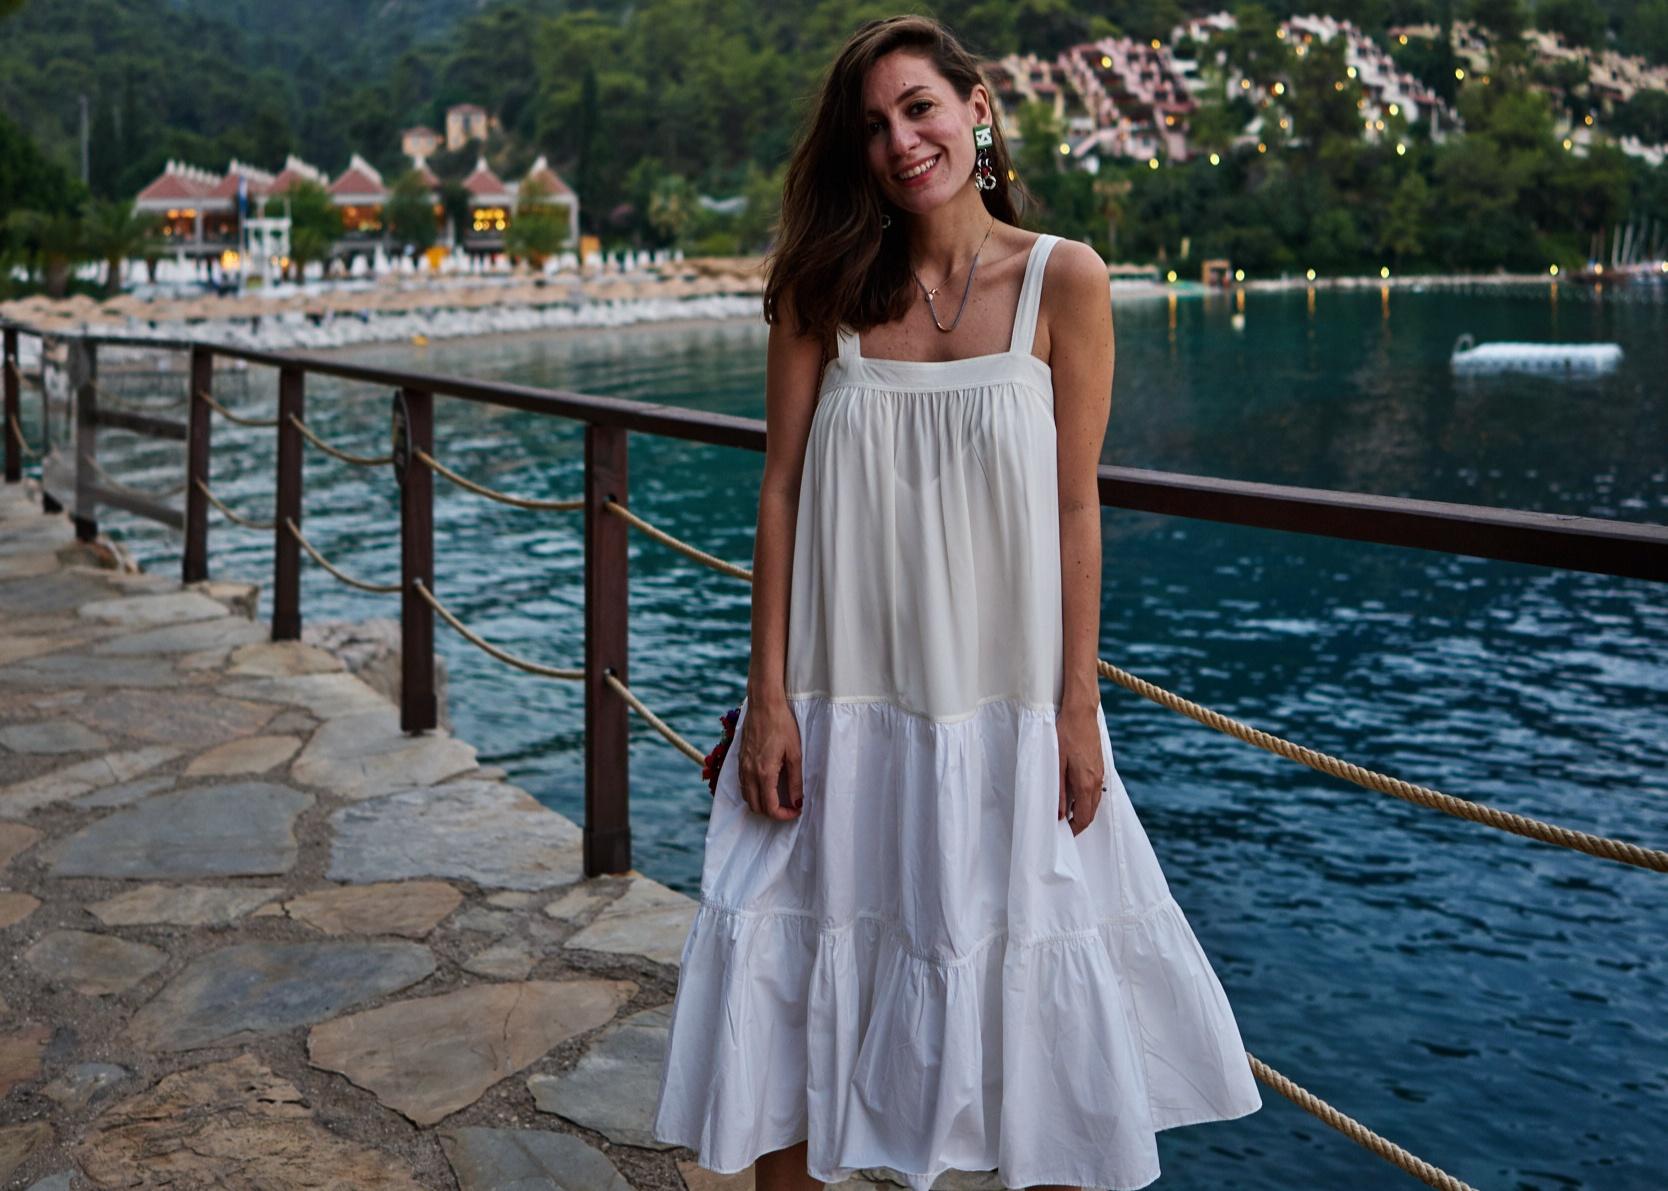 billur saatci, offnegiysem, street style, turkish style blogger, hillside beach club, sunset, heaven on earth, co,